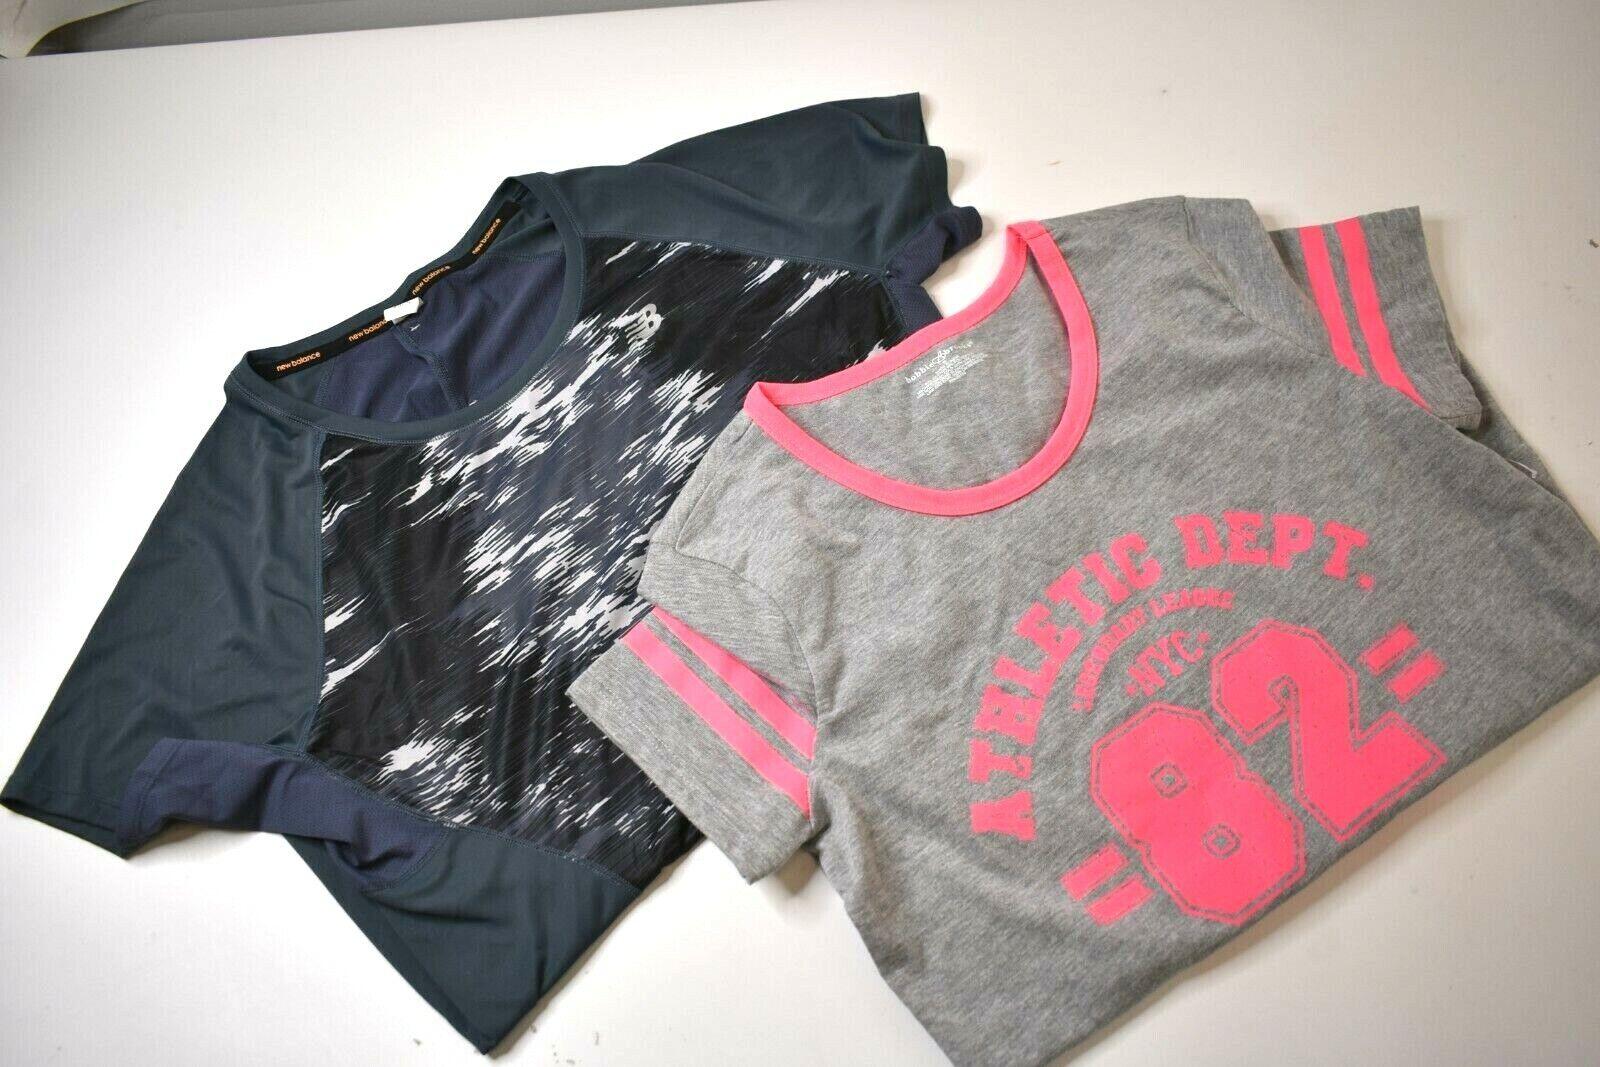 Bobbie Brooks&New Balance Women's Small Short Sleeve Athleticwear Tops Lot of 2